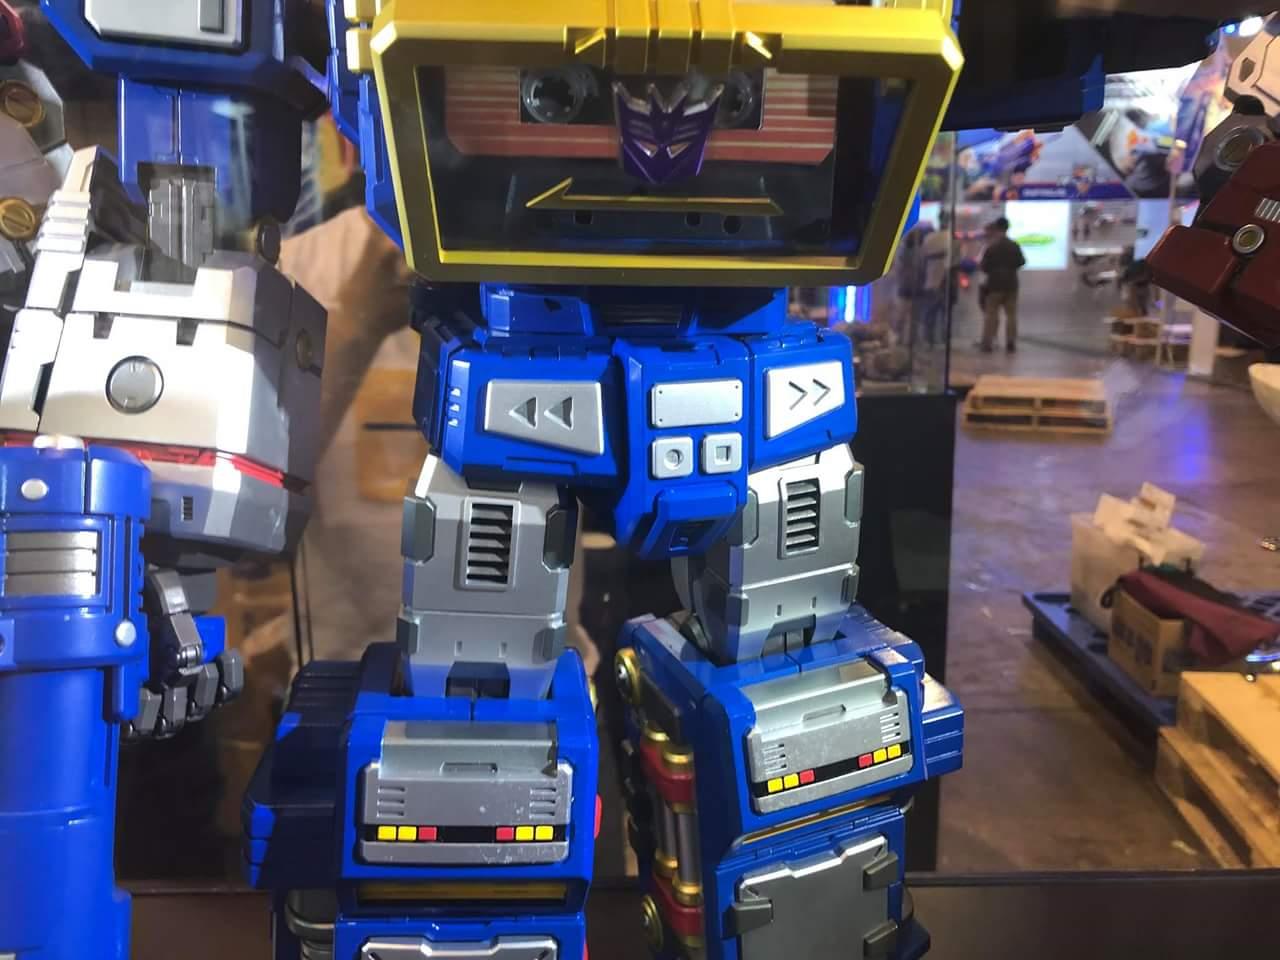 Figurines Transformers G1 (articulé, non transformable) ― Par 3A, Action Toys, Fewture, Toys Alliance, Sentinel, Kotobukiya, Kids Logic, Herocross, EX Gokin, etc - Page 6 CPSRQTil_o